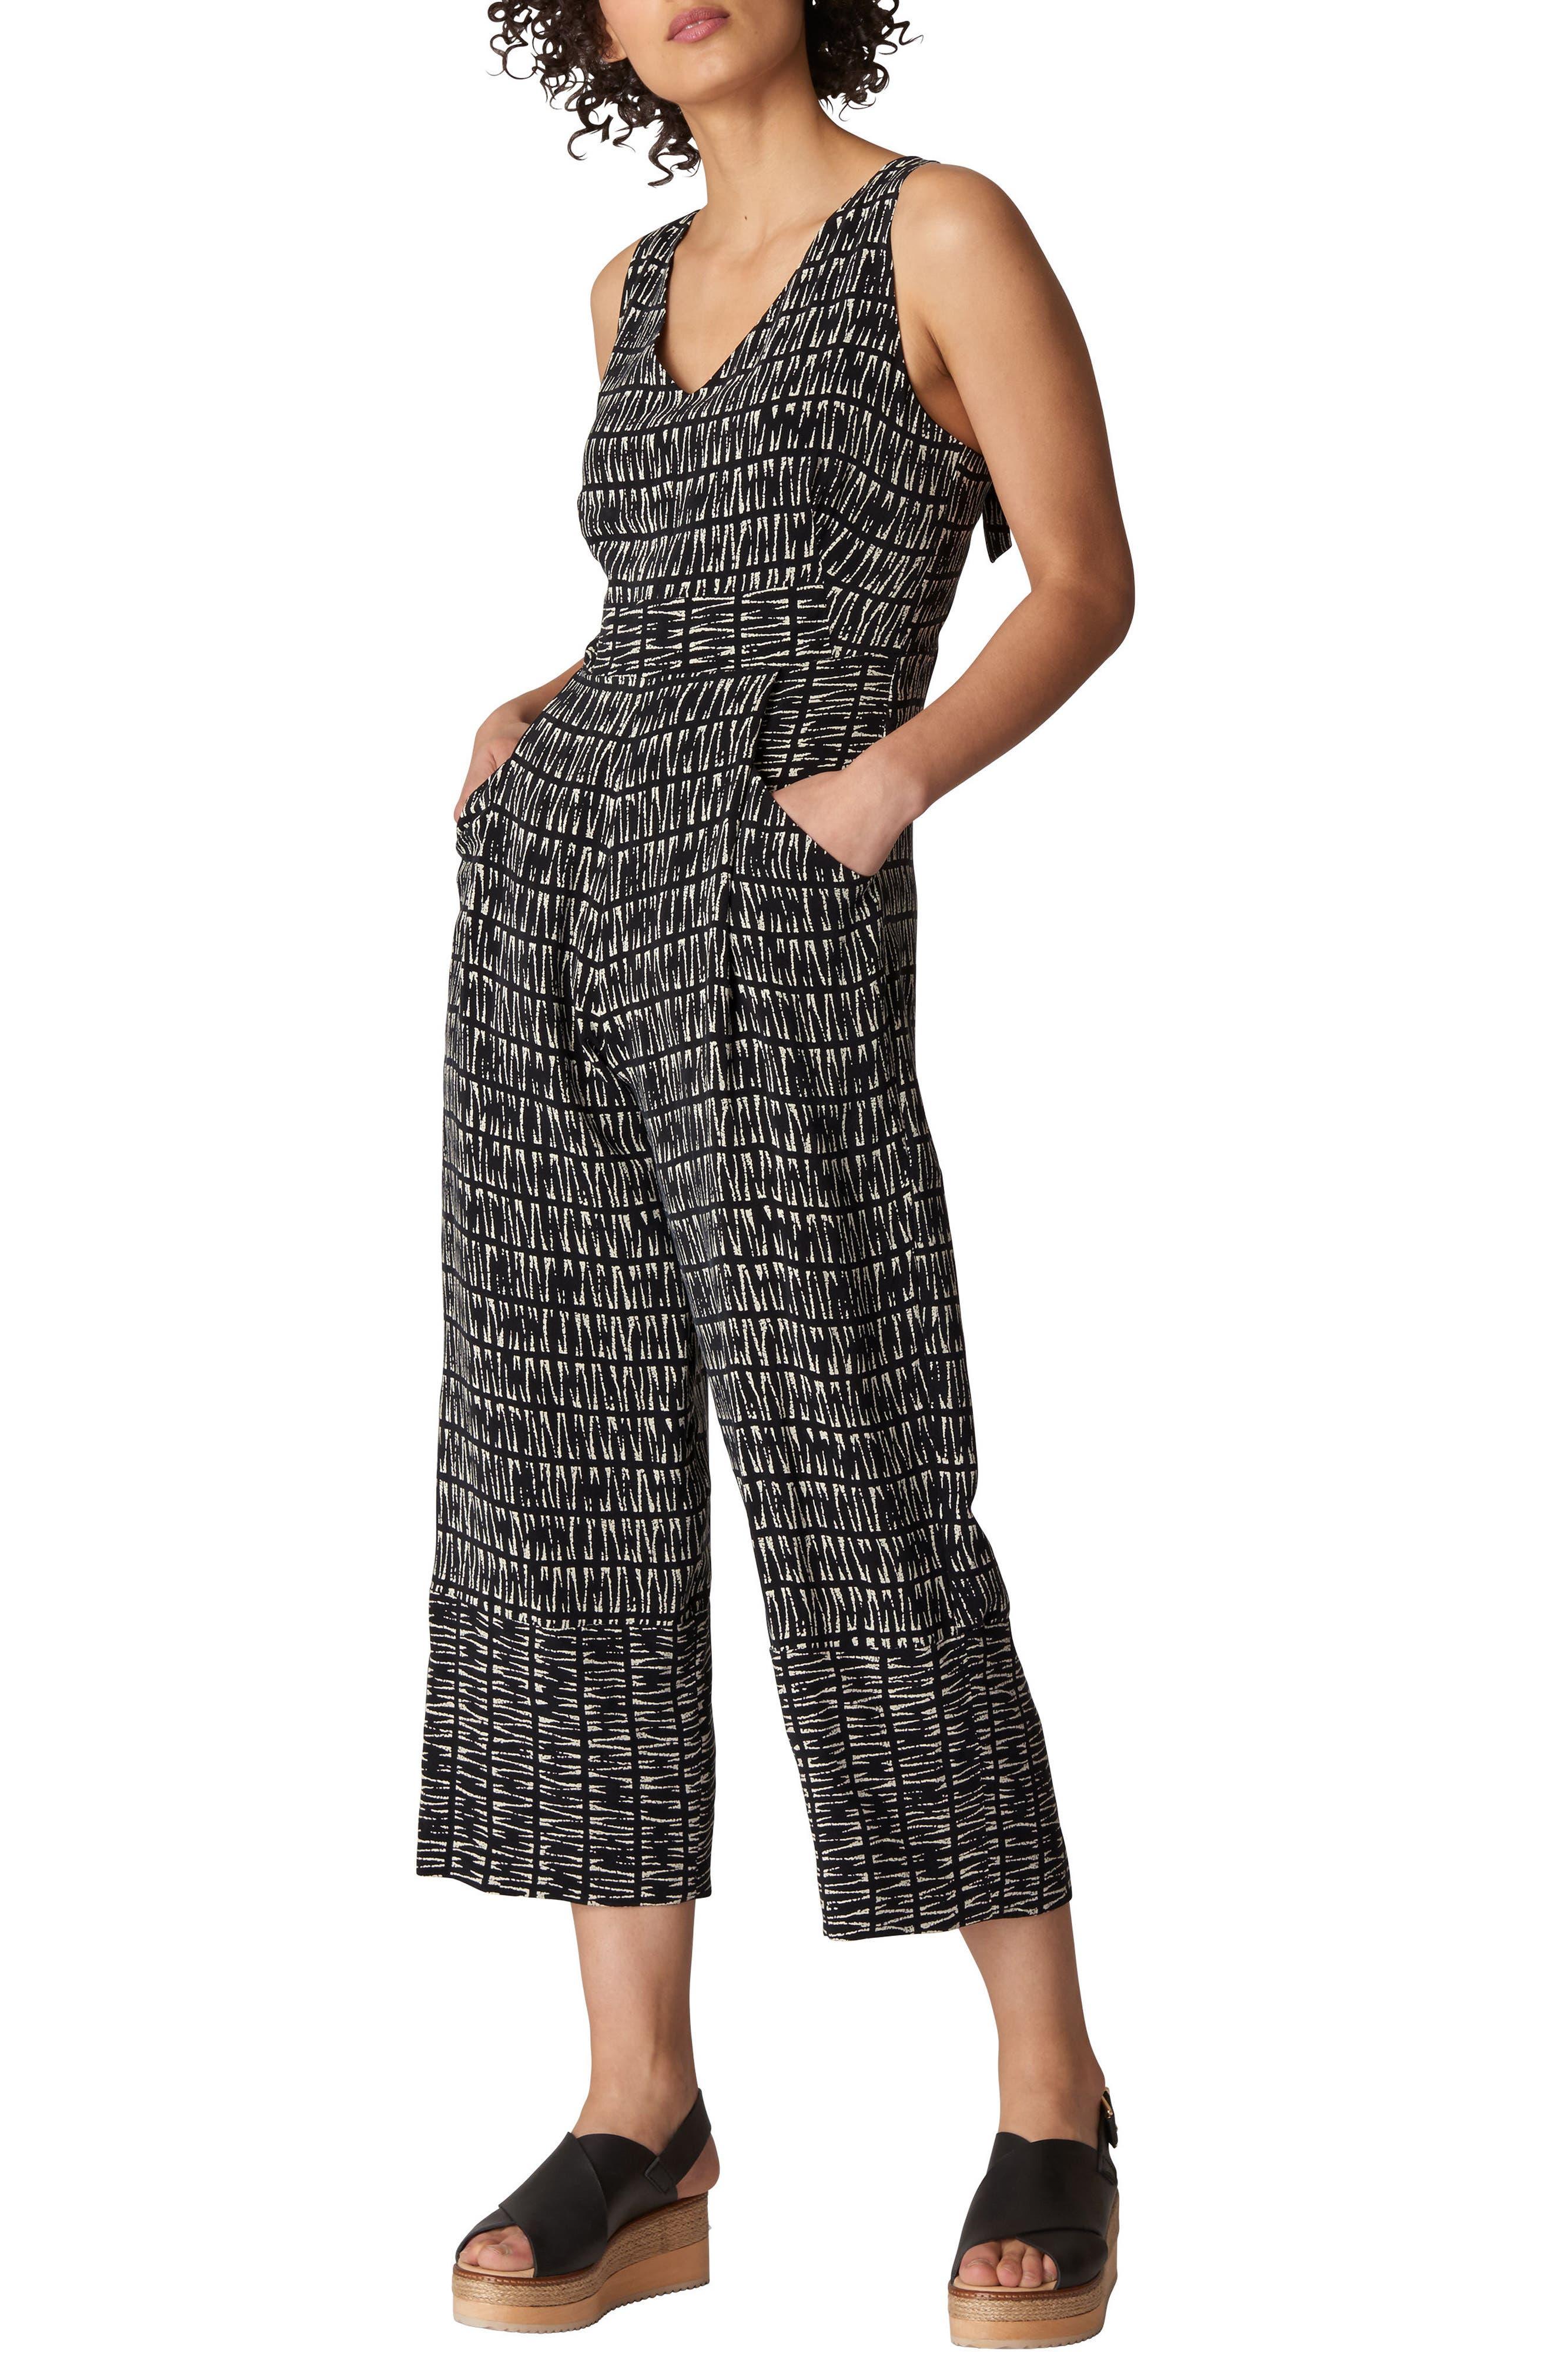 Mara Sahara Print Jumpsuit,                         Main,                         color, Black/ Multi